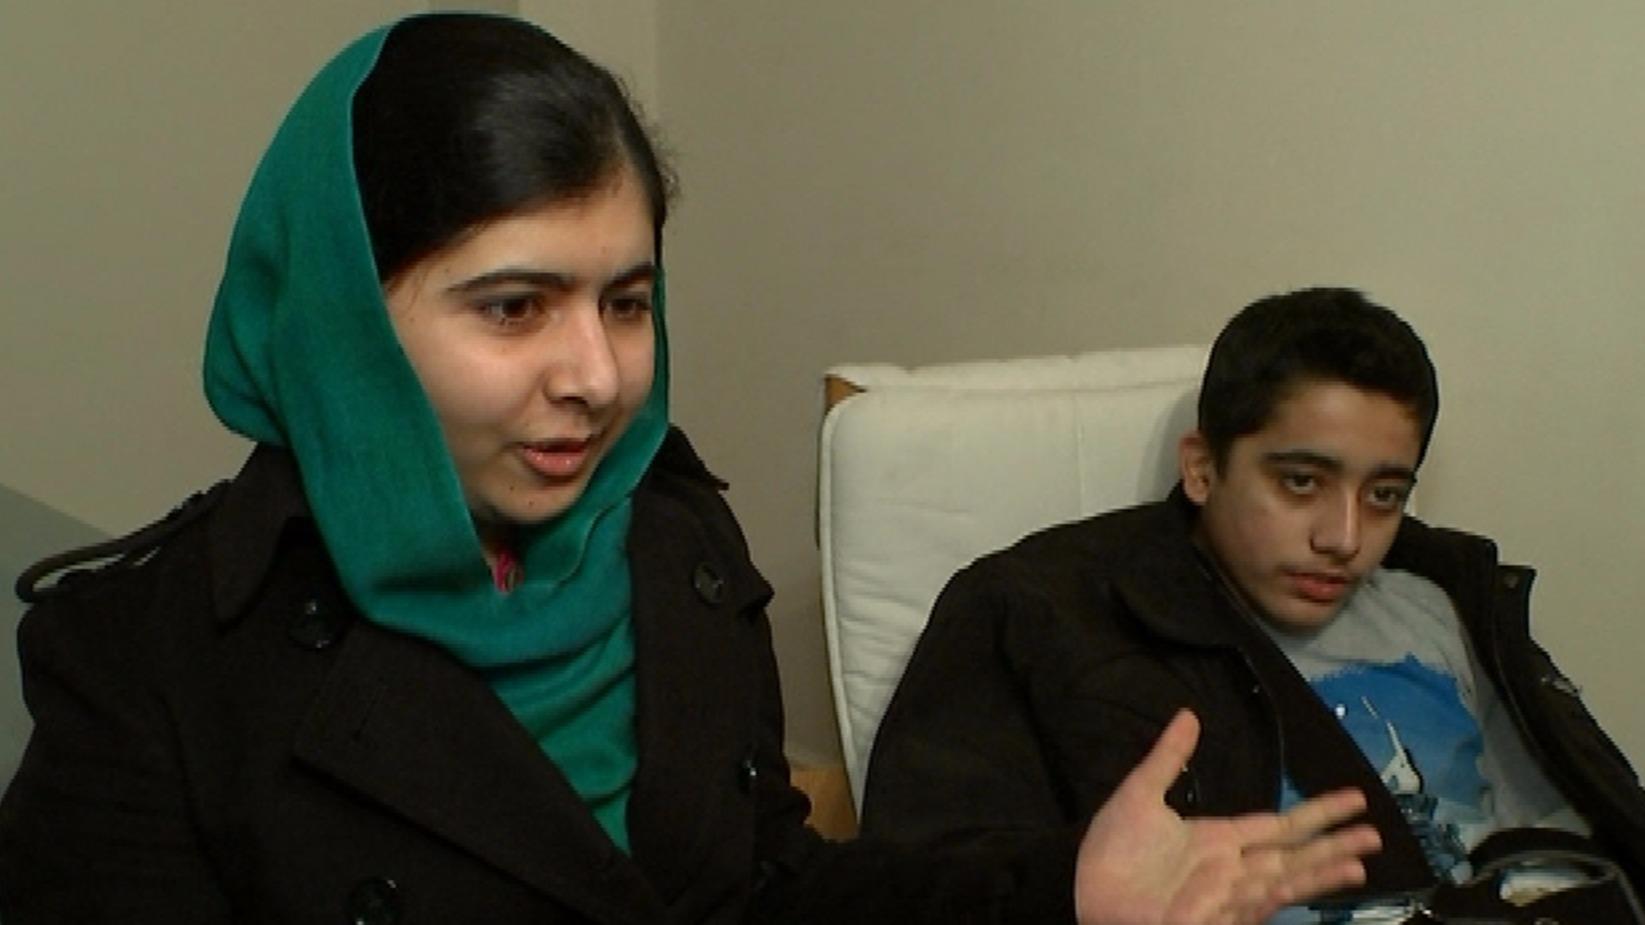 malala yousafzais fight for education In pakistan, malala says she will continue fight for girls' education march 29, 2018 pakistani nobel peace prize winner malala yousafzai, left.